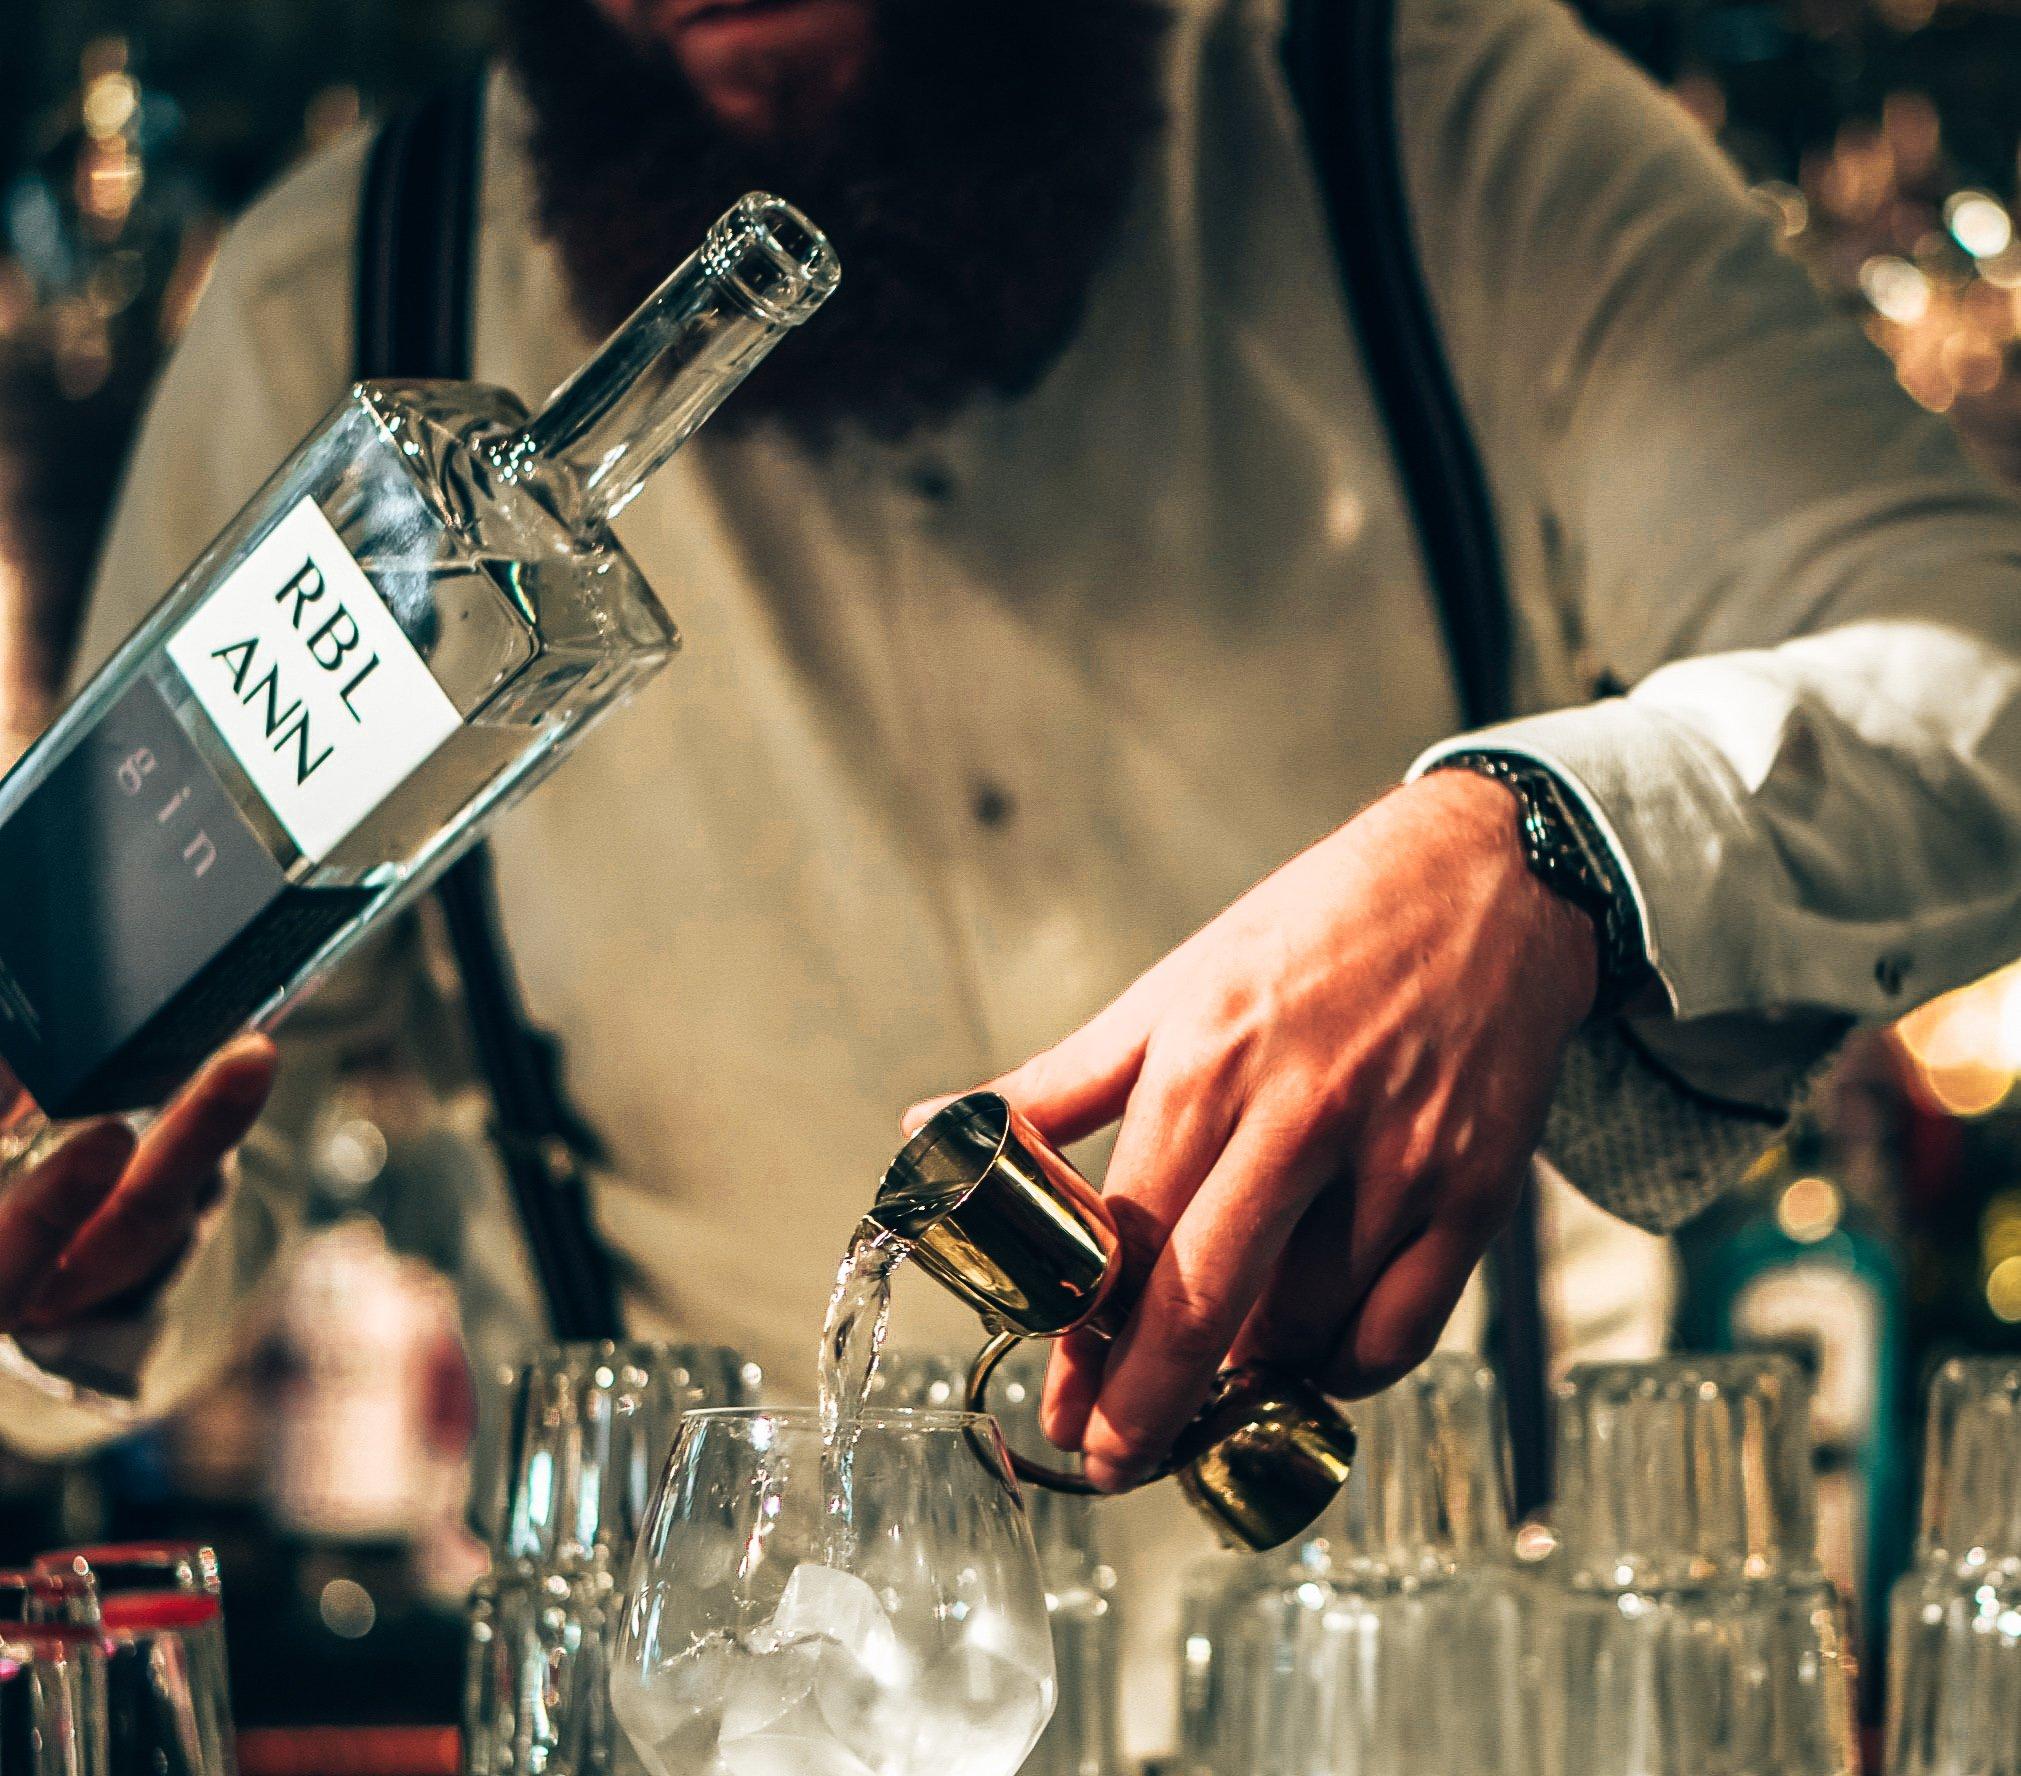 RBL ANN gin proeven, Alles over gin.